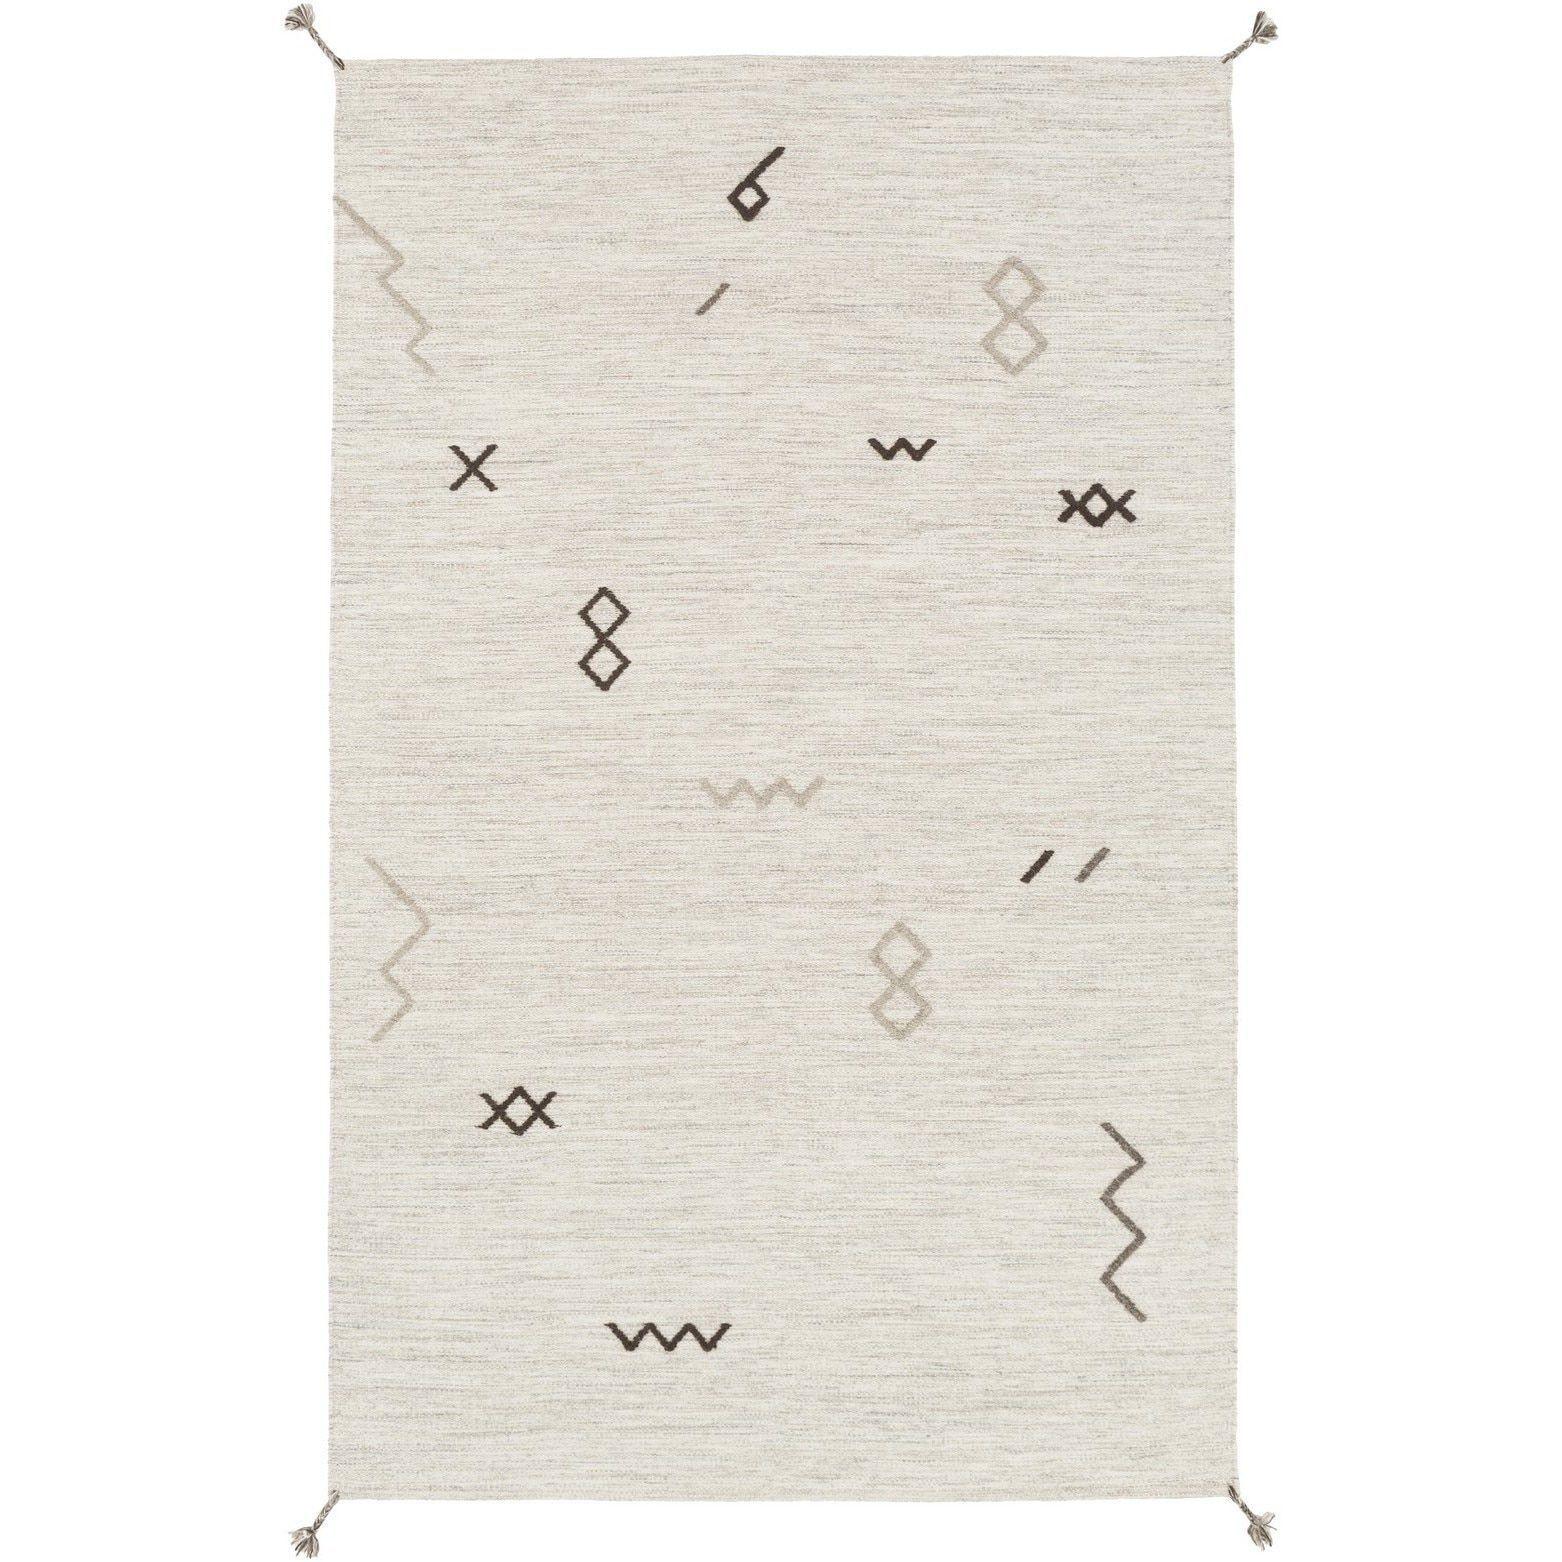 Hand-Woven Macy Wool Rug (3'3 x 5'3) (Light Grey), Beige, Size 3' x 5'